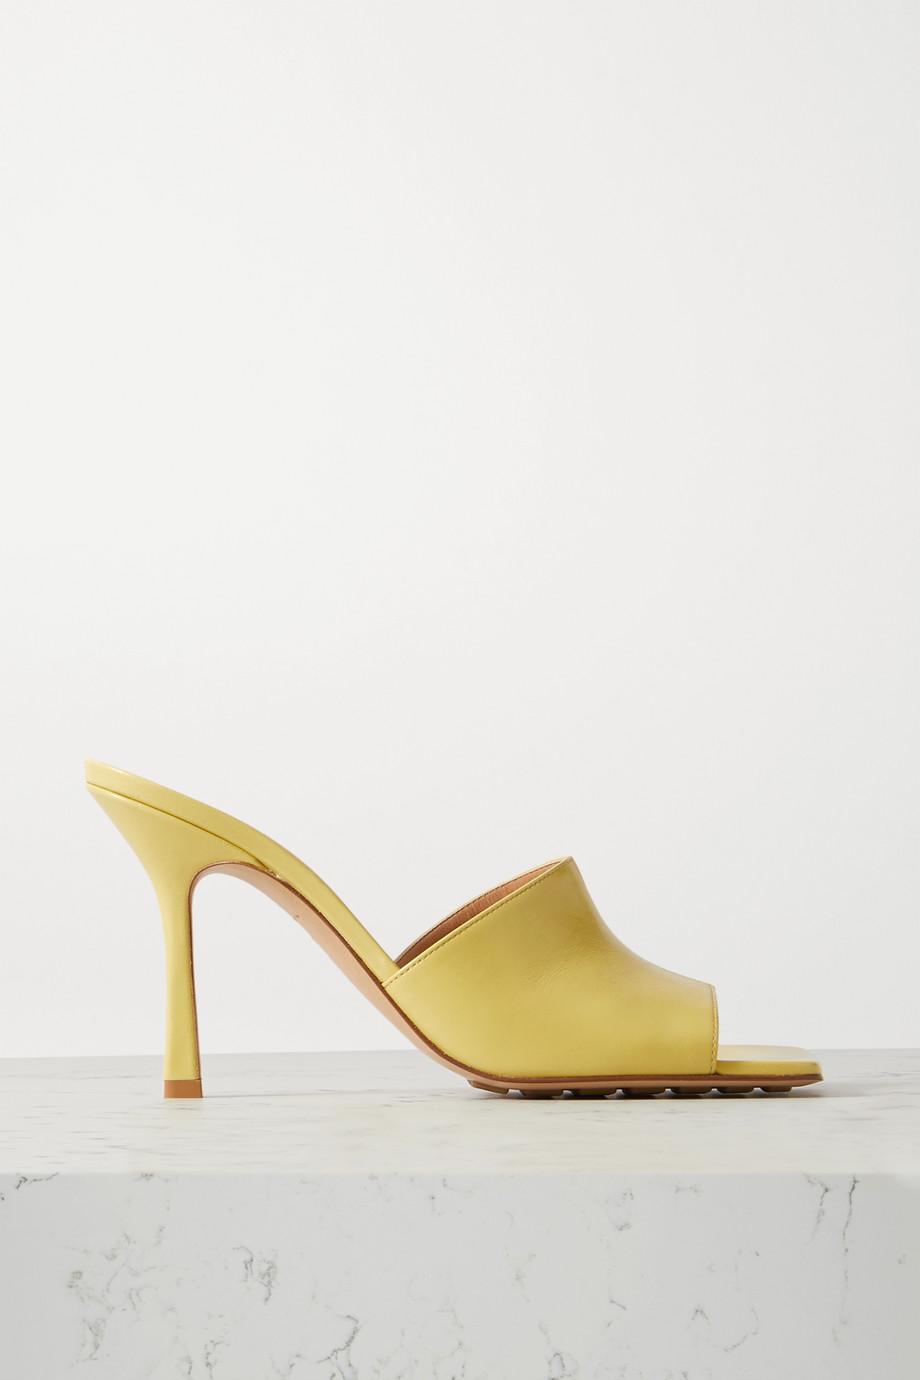 Bottega Veneta 皮革穆勒鞋